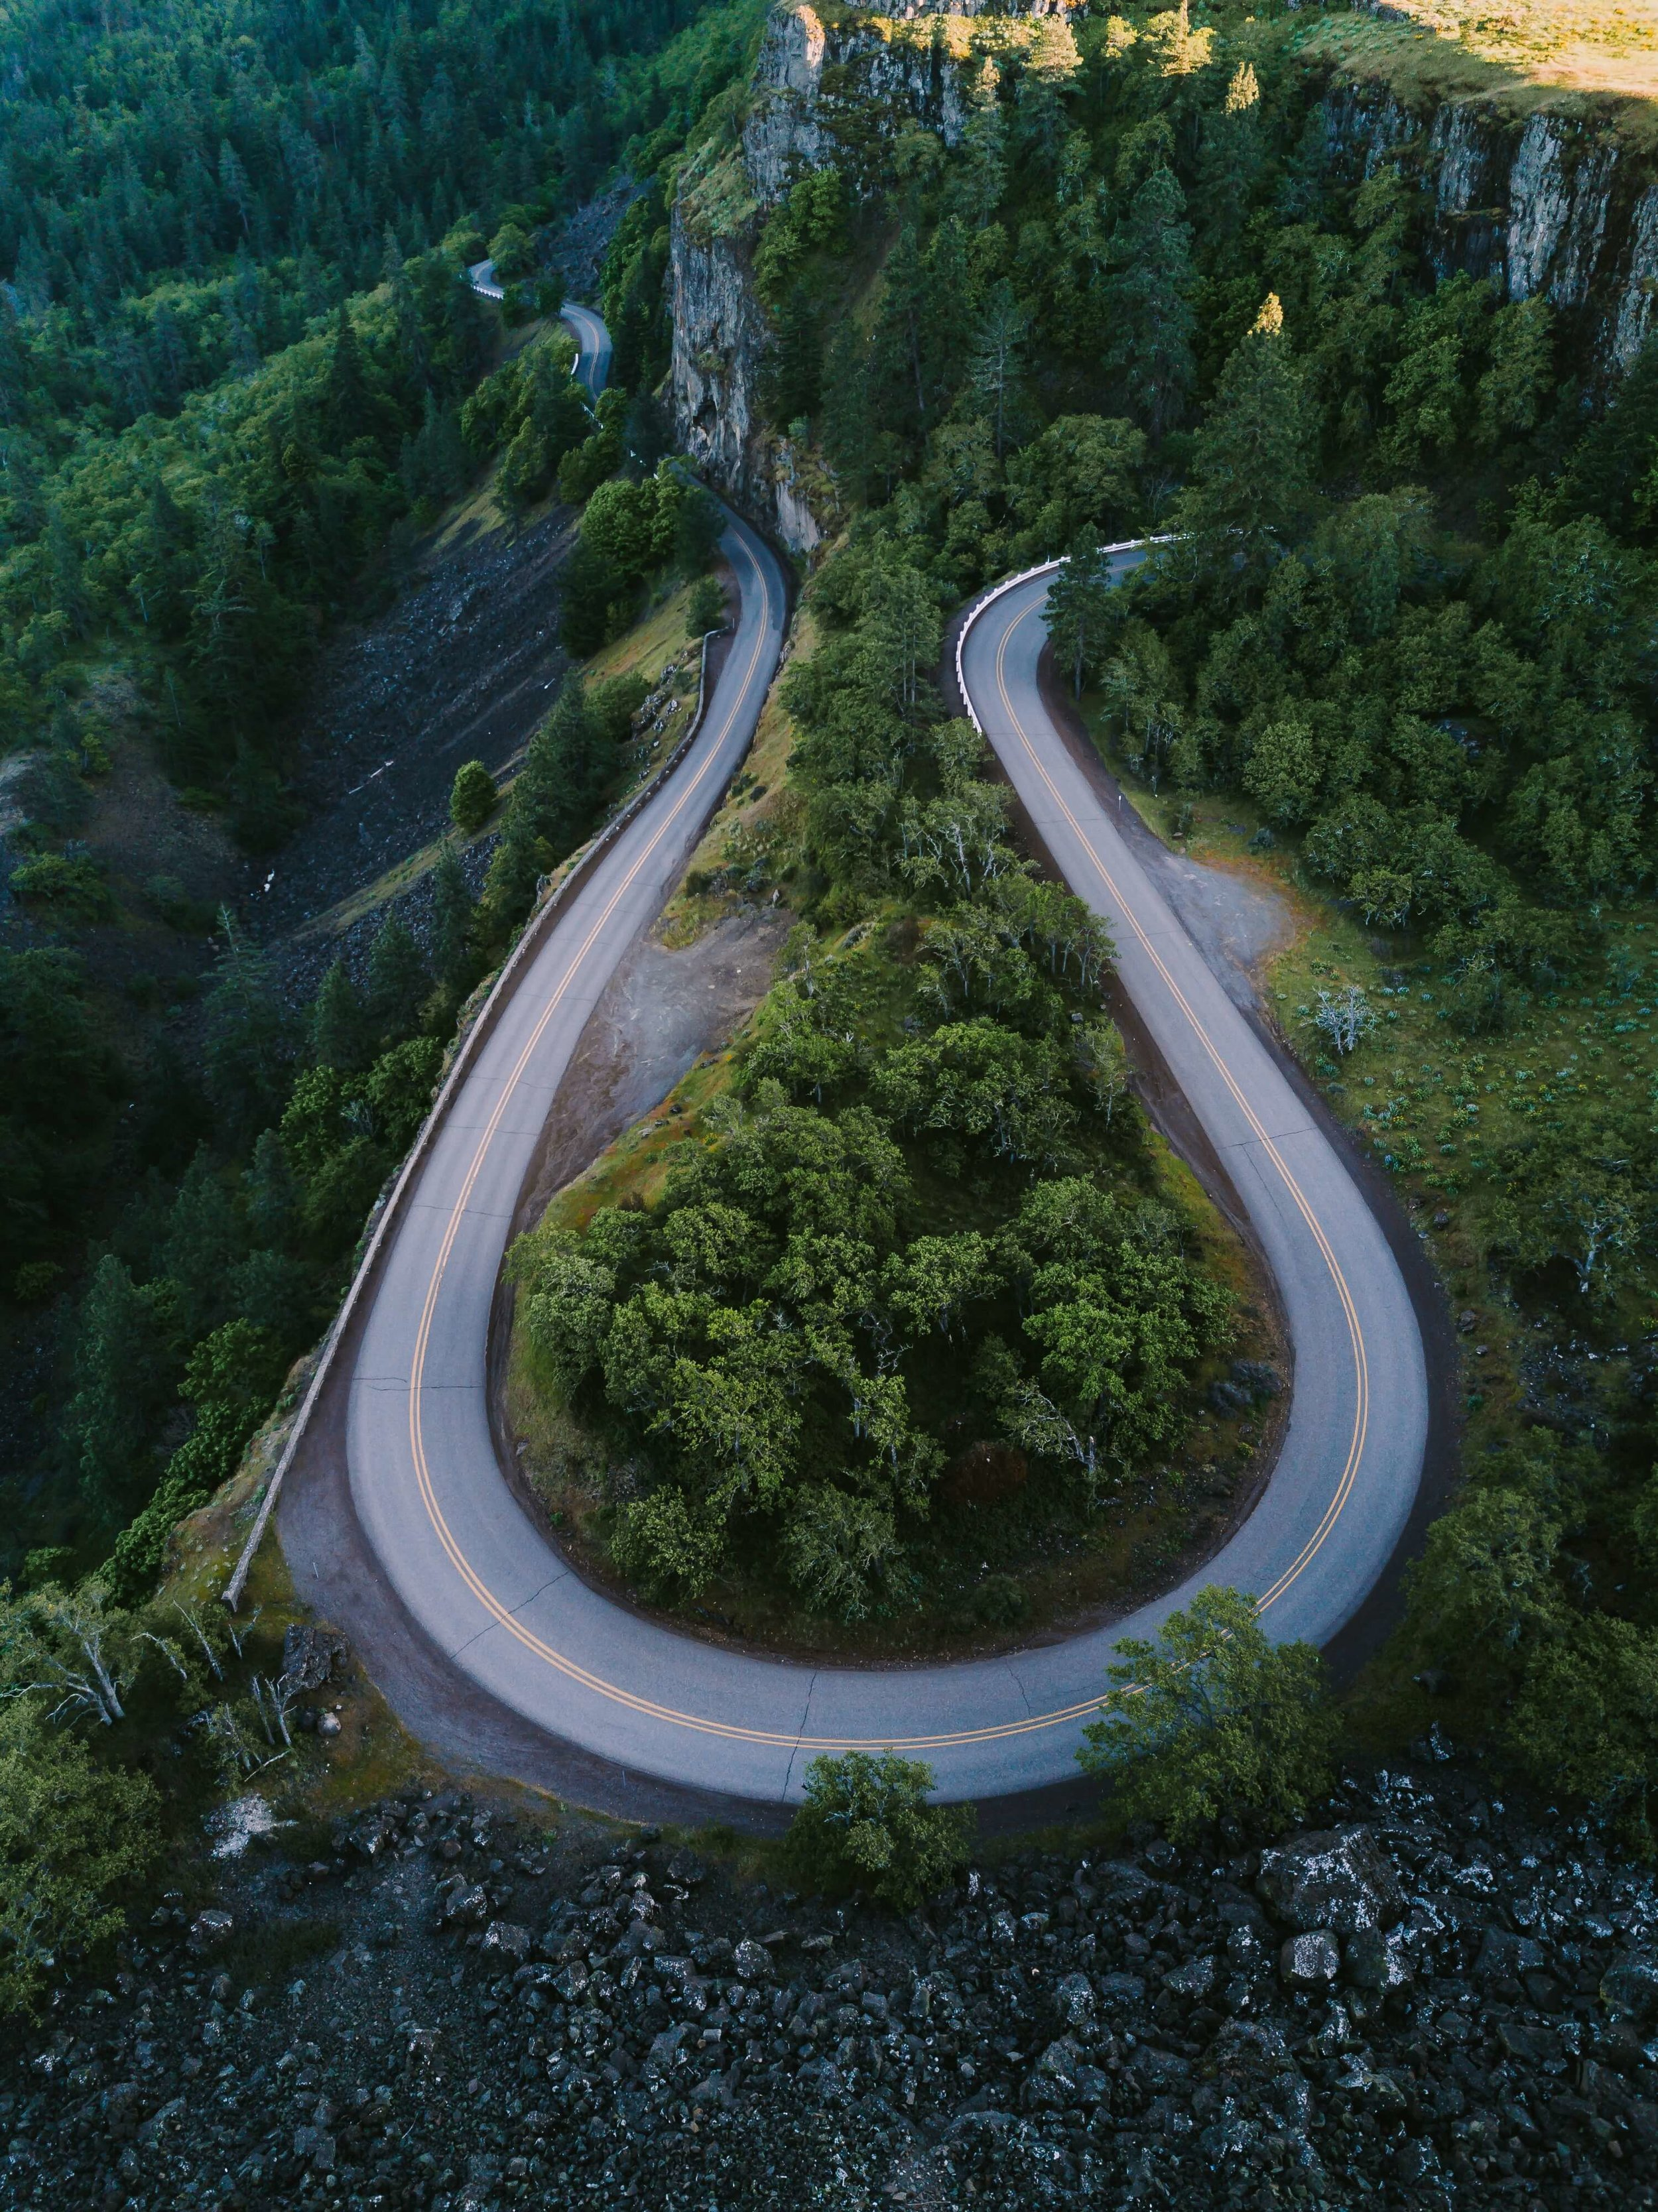 Road changes direction, u turn